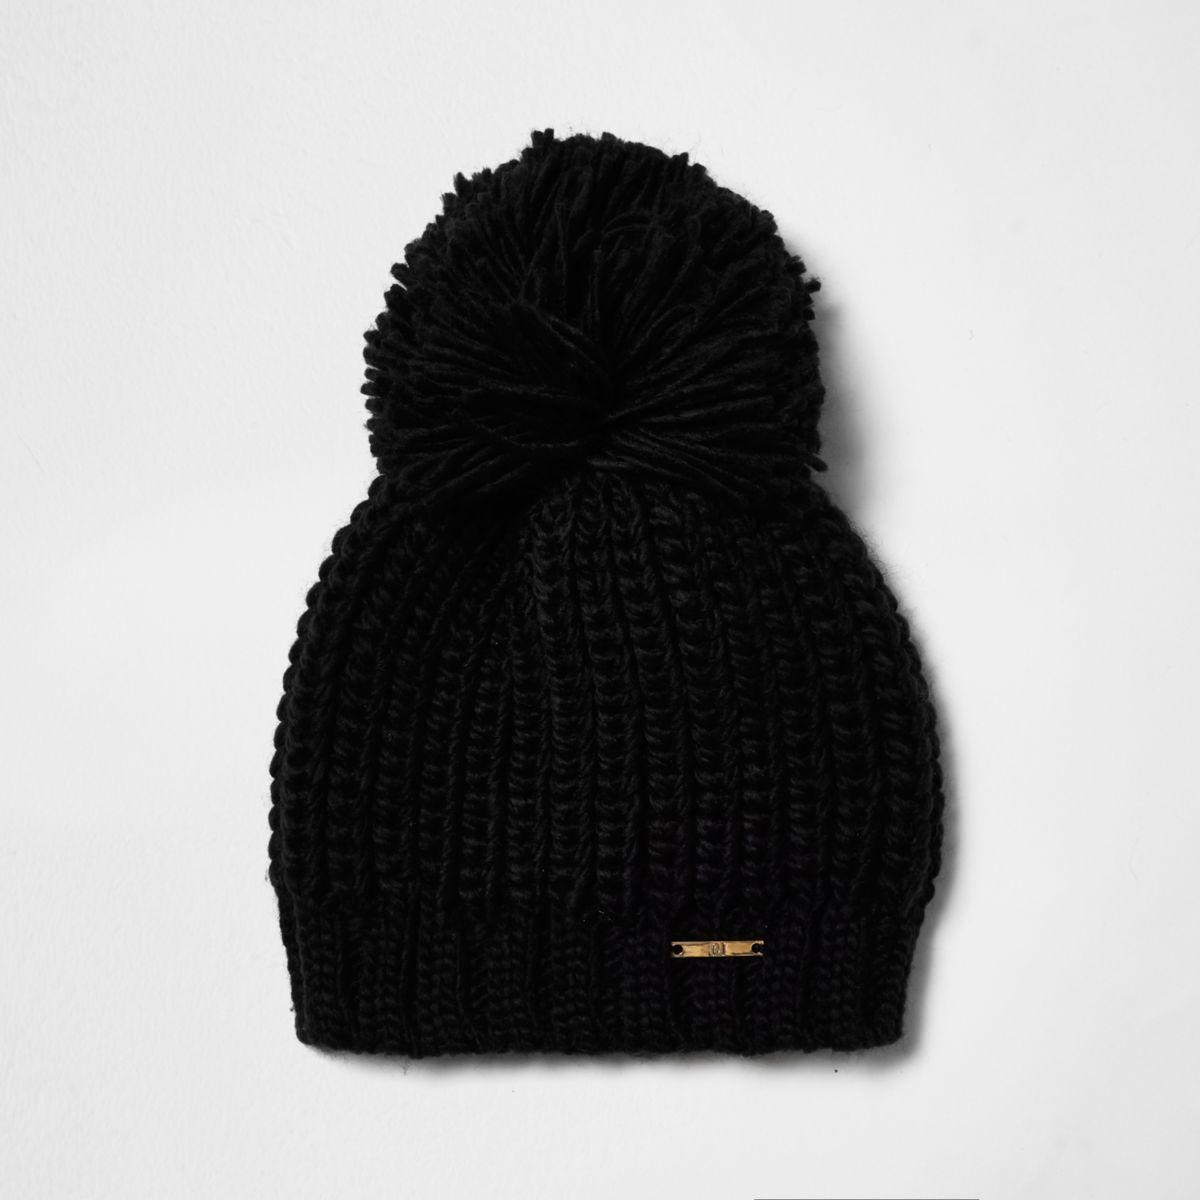 Black bobble pom pom knit beanie hat